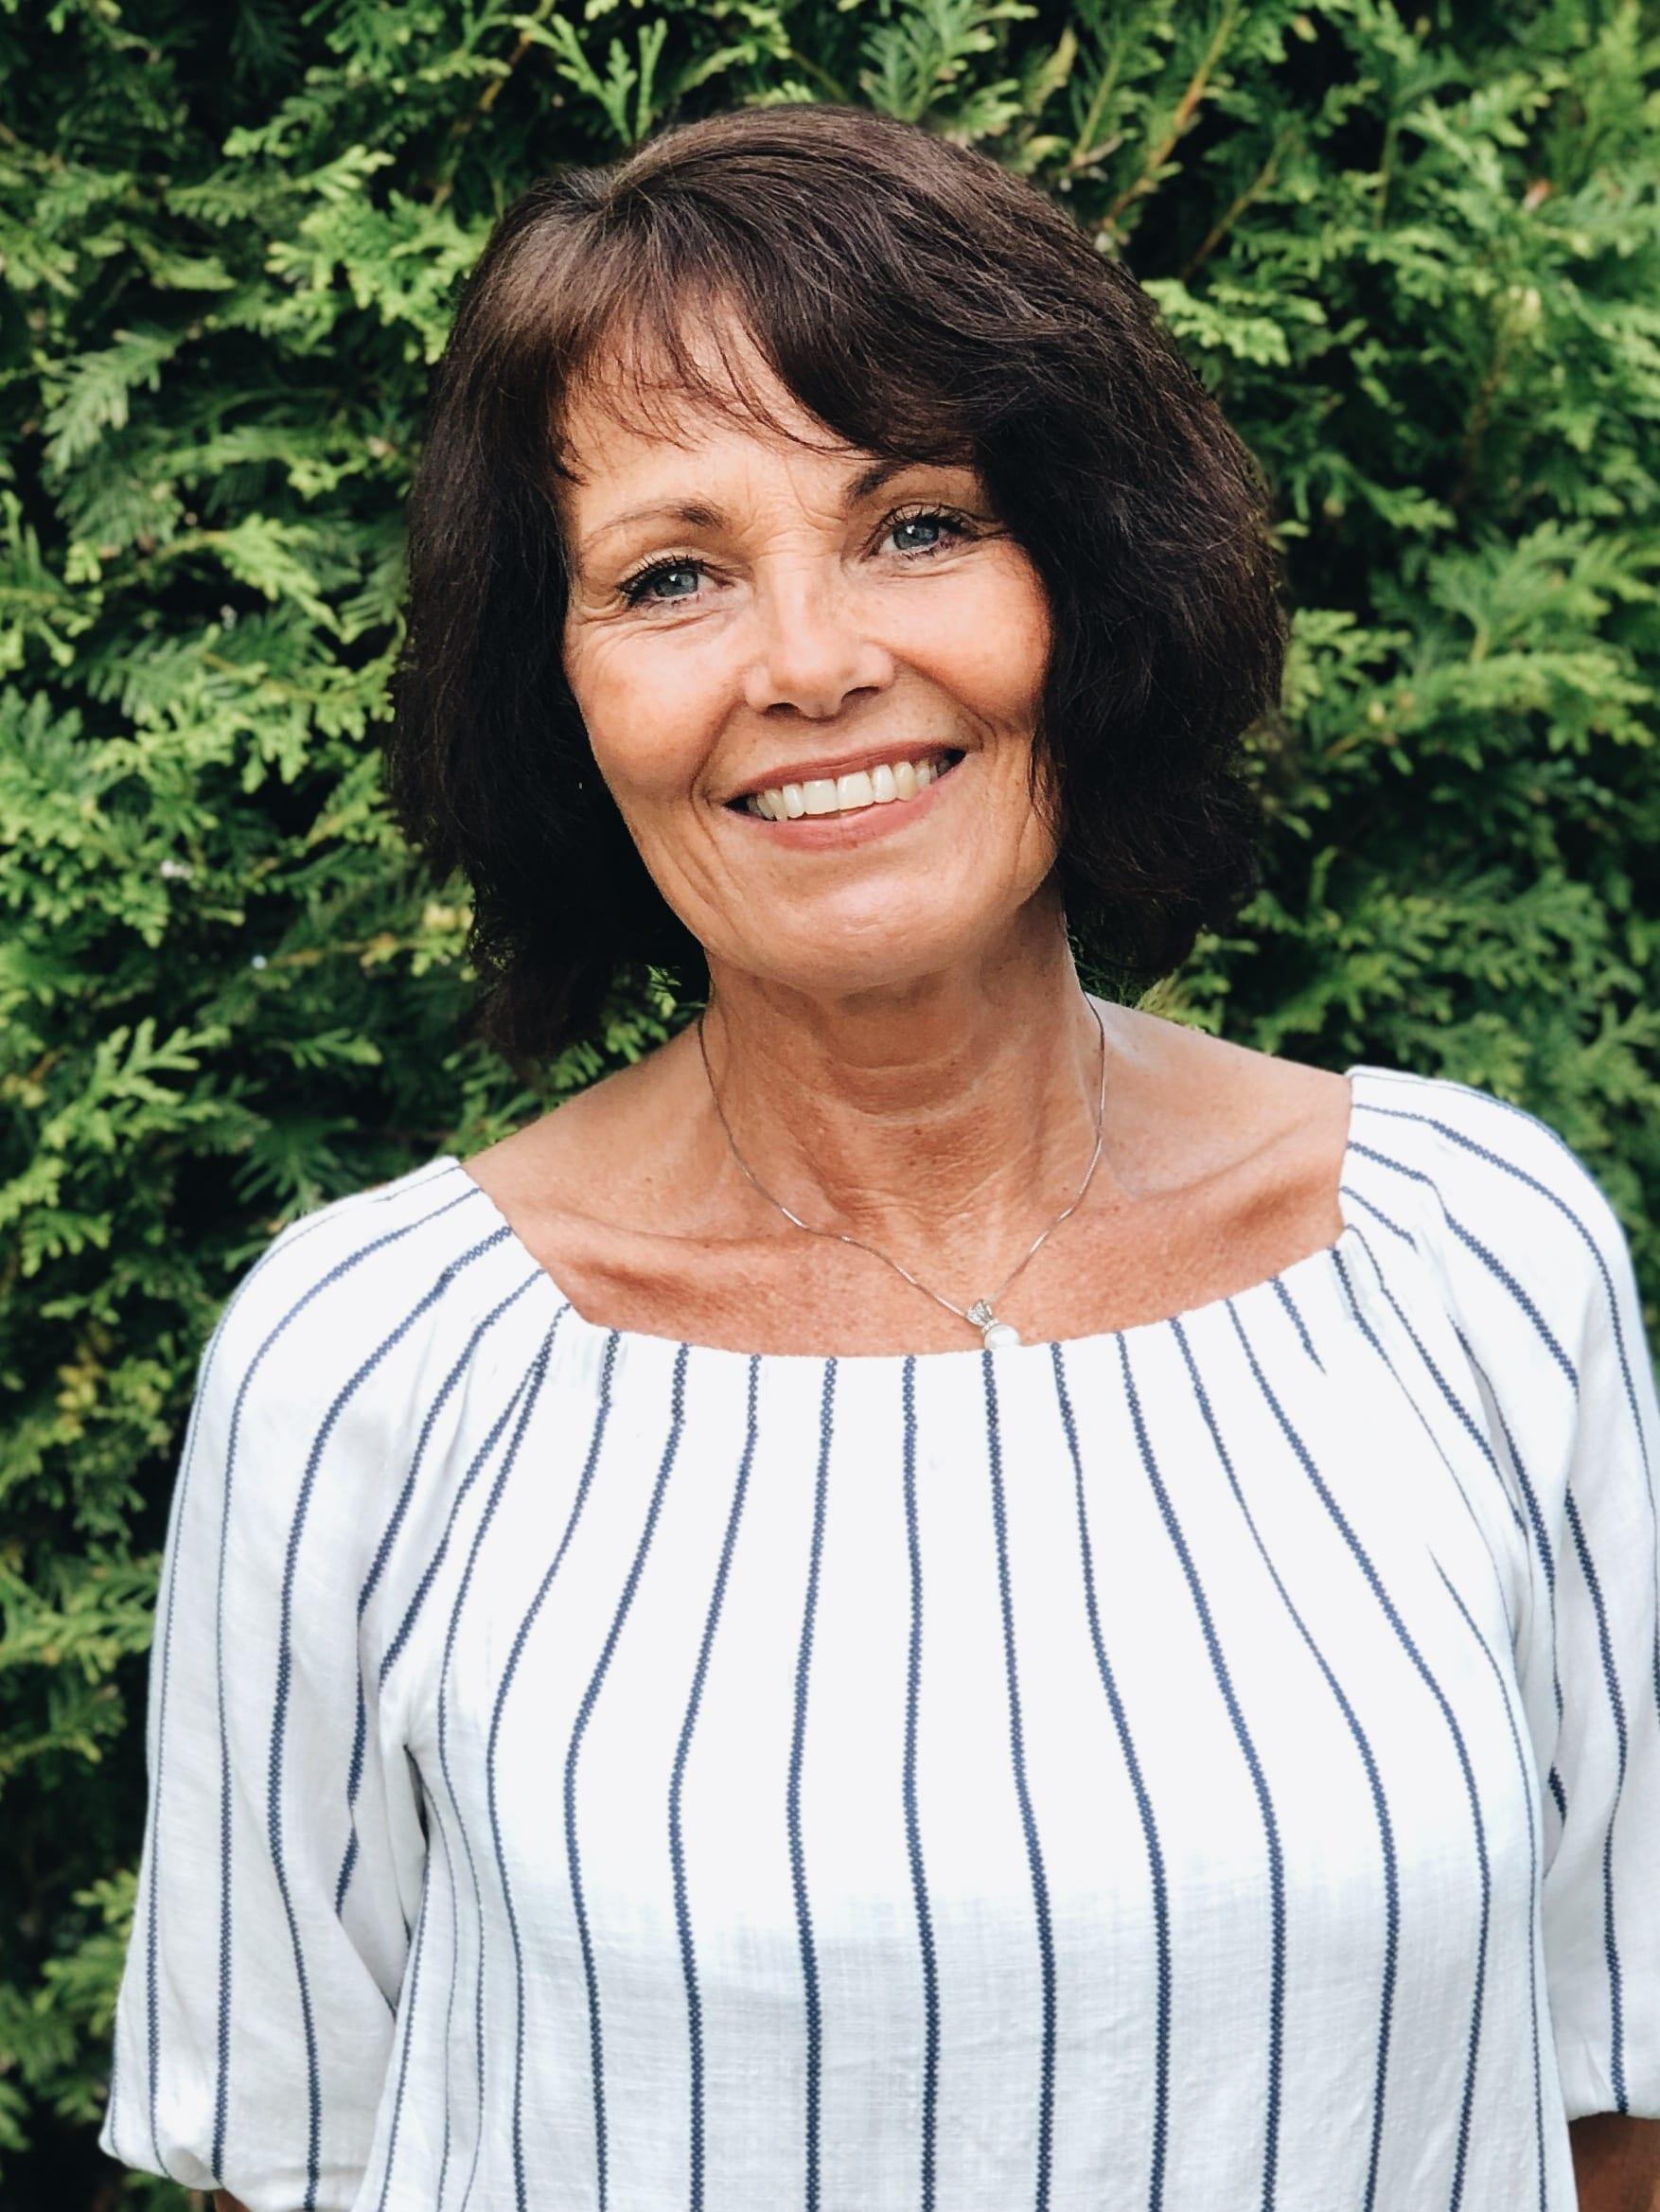 Sylvi Loland